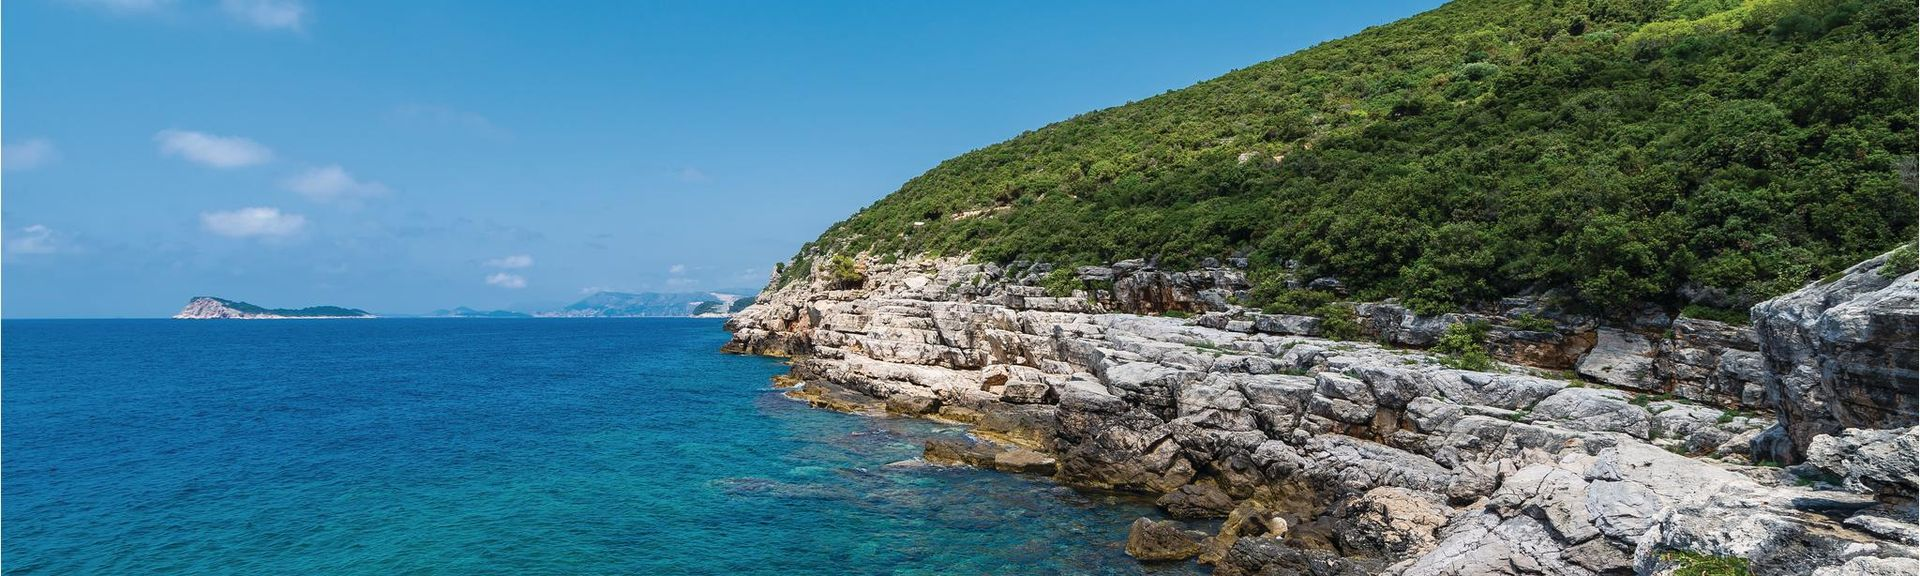 Gruda, Konavle, Dubrovnik-Neretva, Kroatien